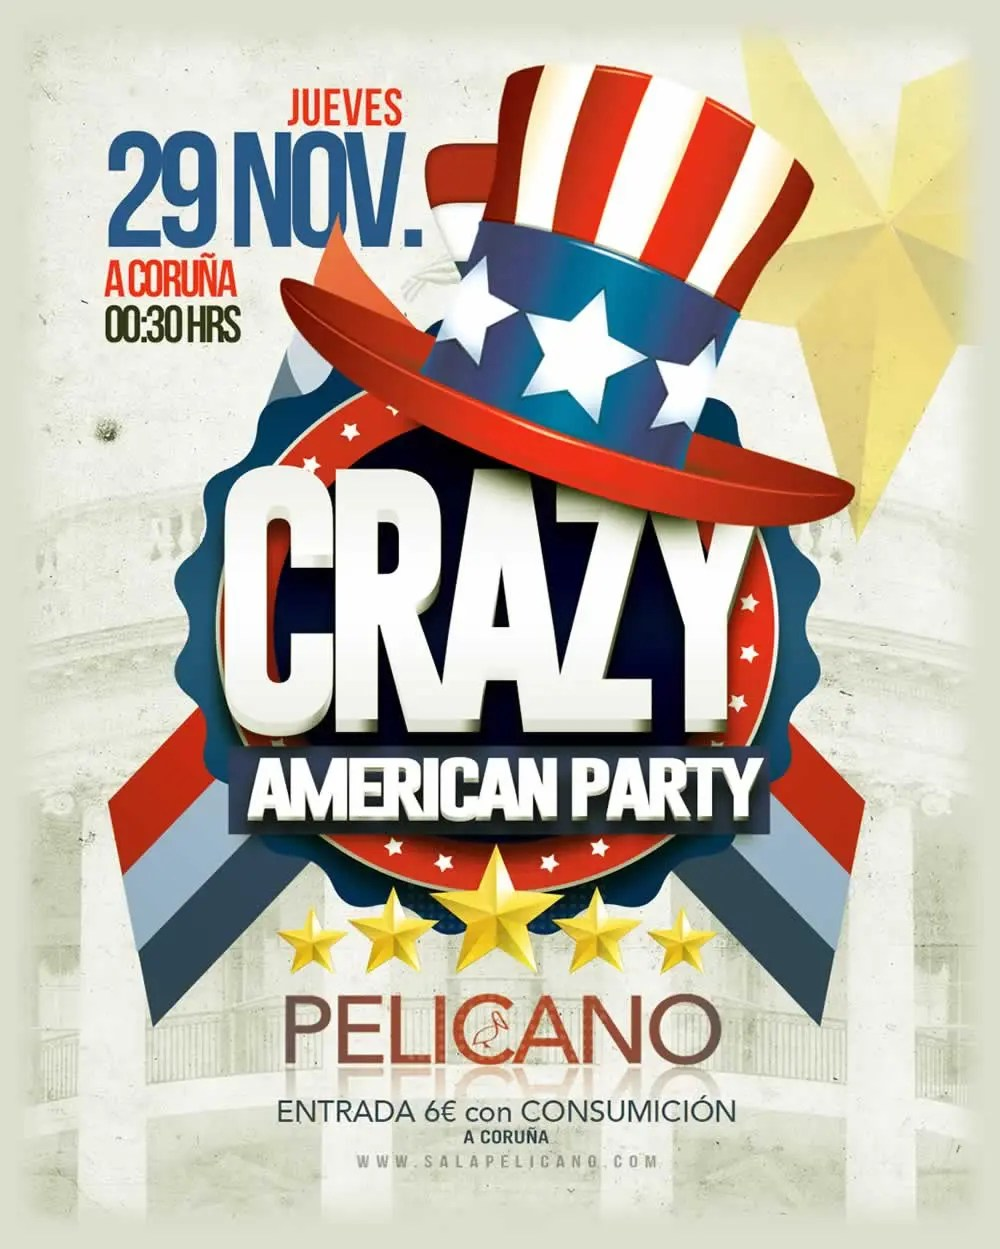 Crazy American Party